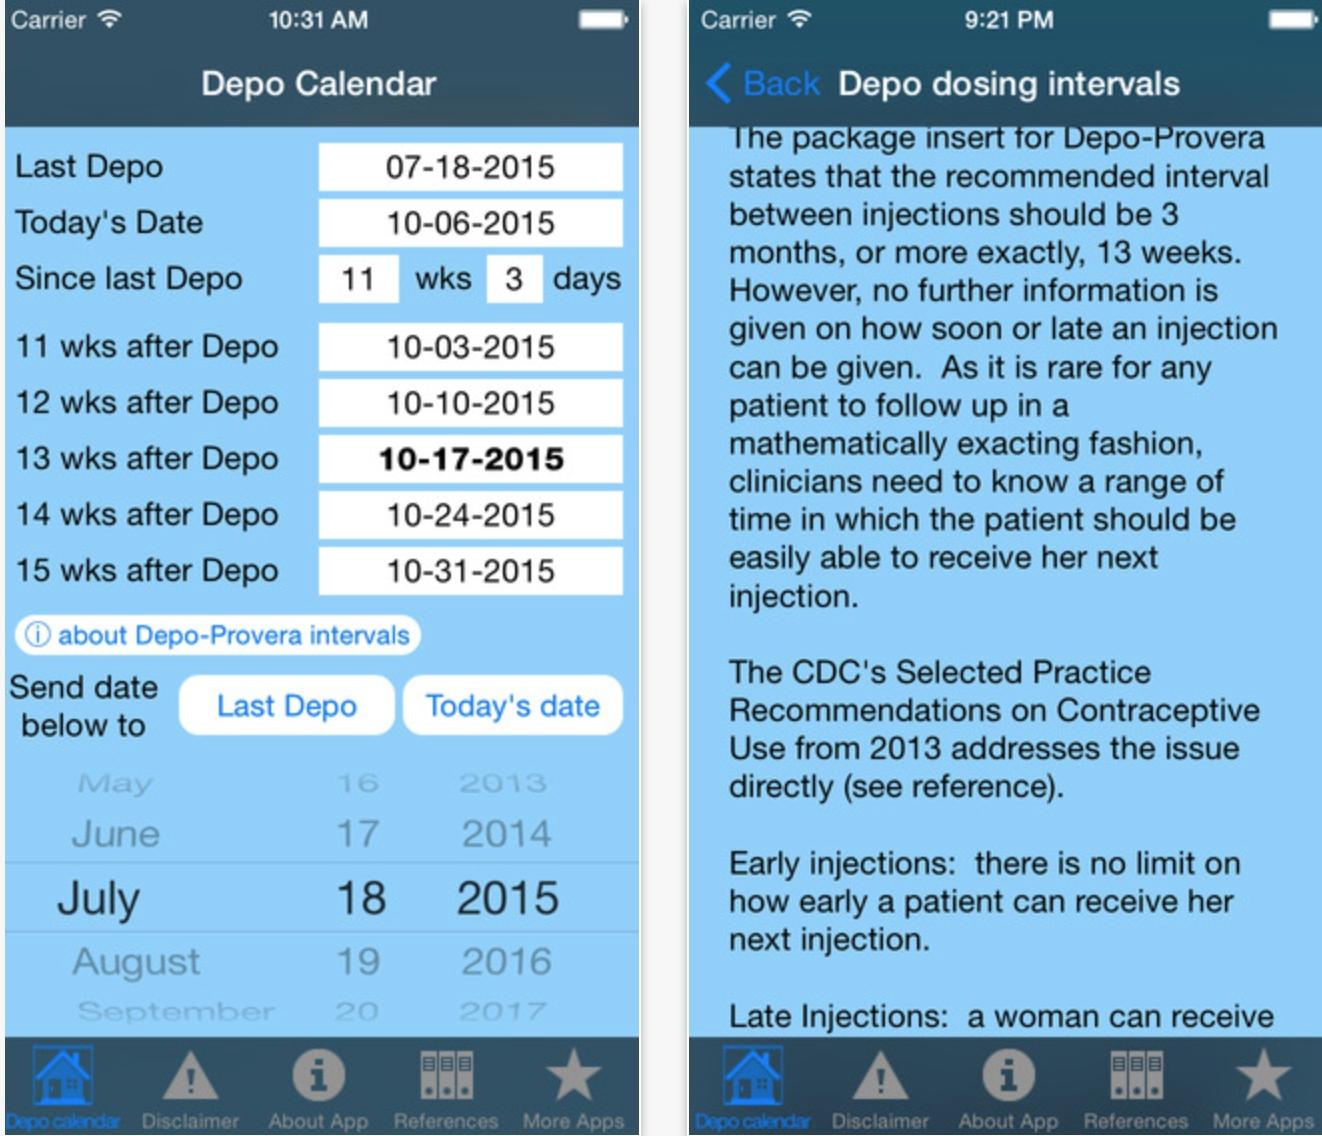 Depo Calendar App Could Significantly Improve Contraception  Depo Calendar October